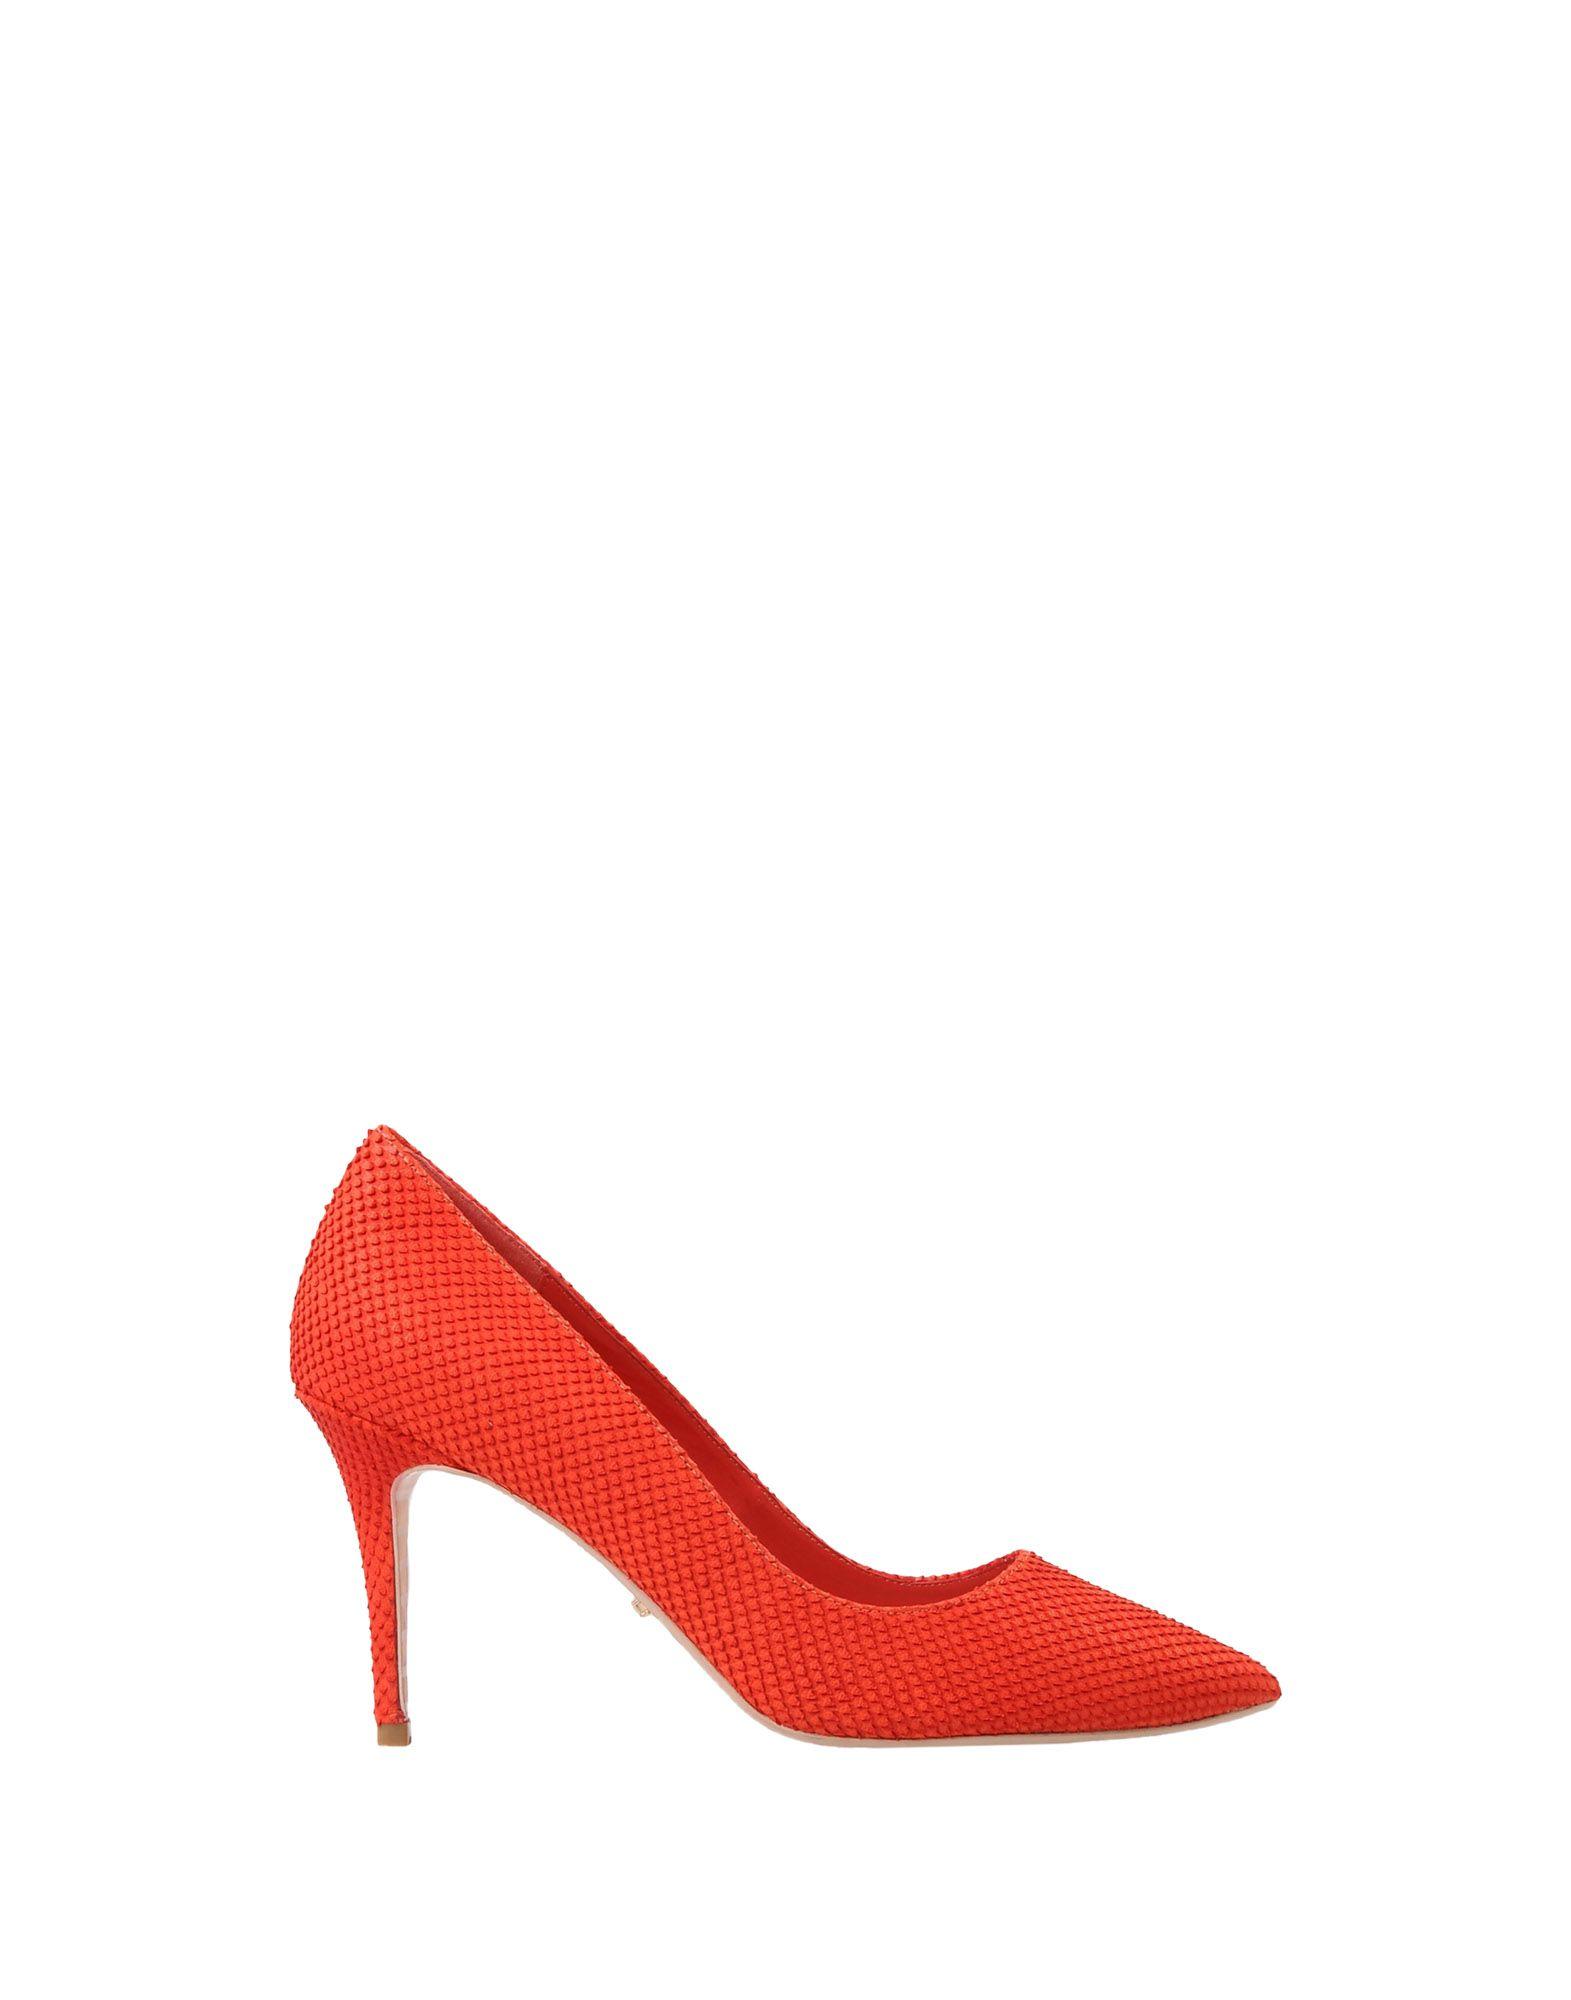 Dune Dune  London Aurrora  11451406UE Heiße Schuhe 5d504a